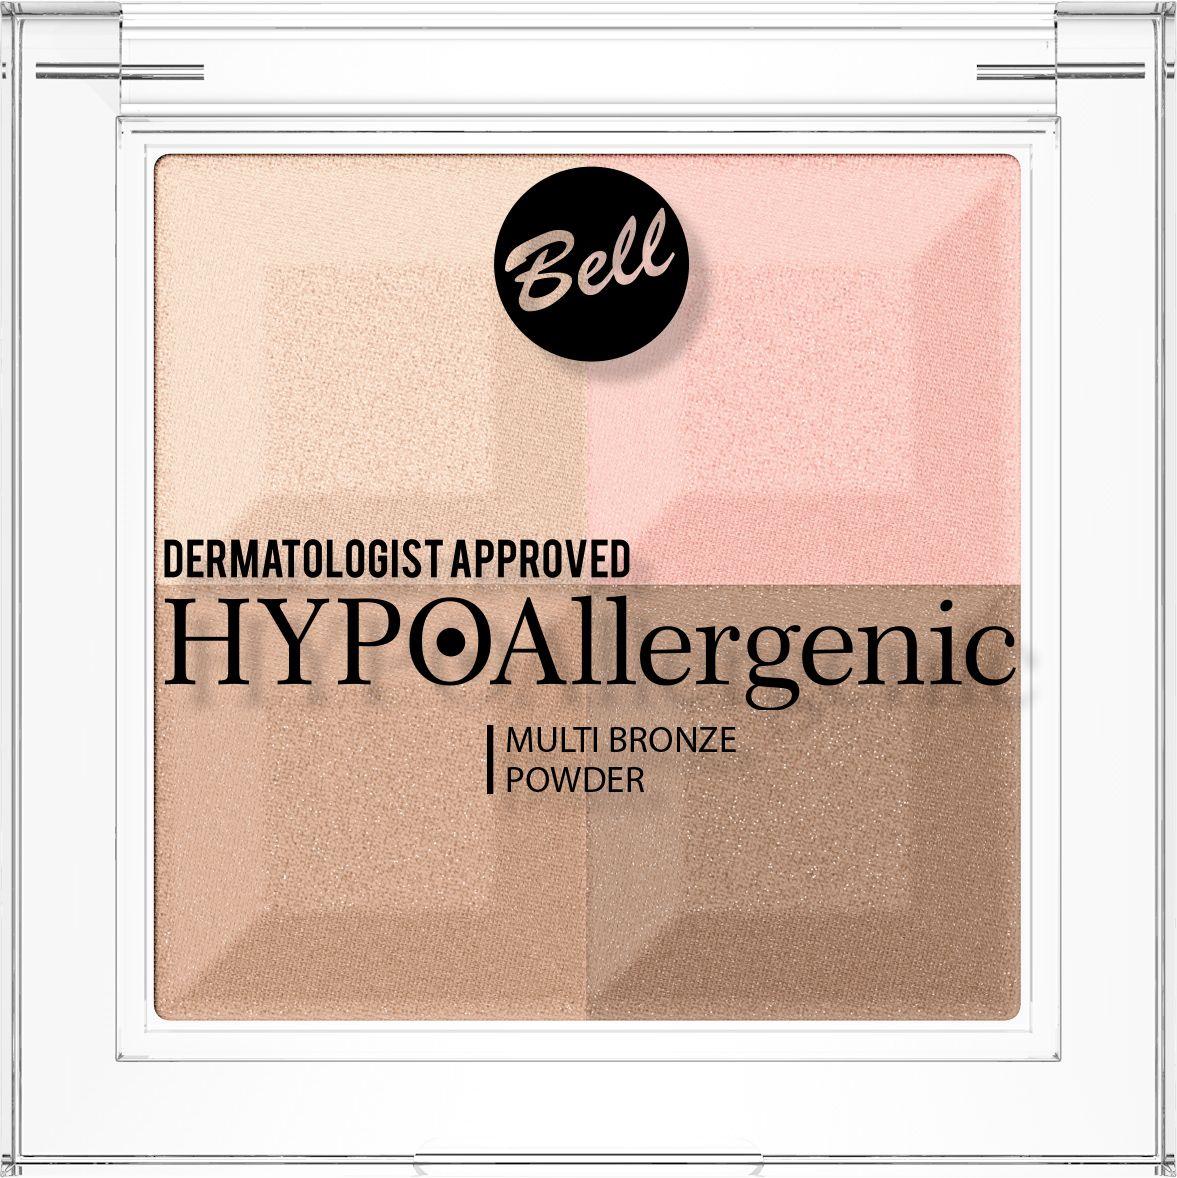 Bell Hypoallergenic Пудра с бронзирующим и осветляющим эффектом Multi Bronze Powder, Тон №02 пудра bell bell be091lwelfm8